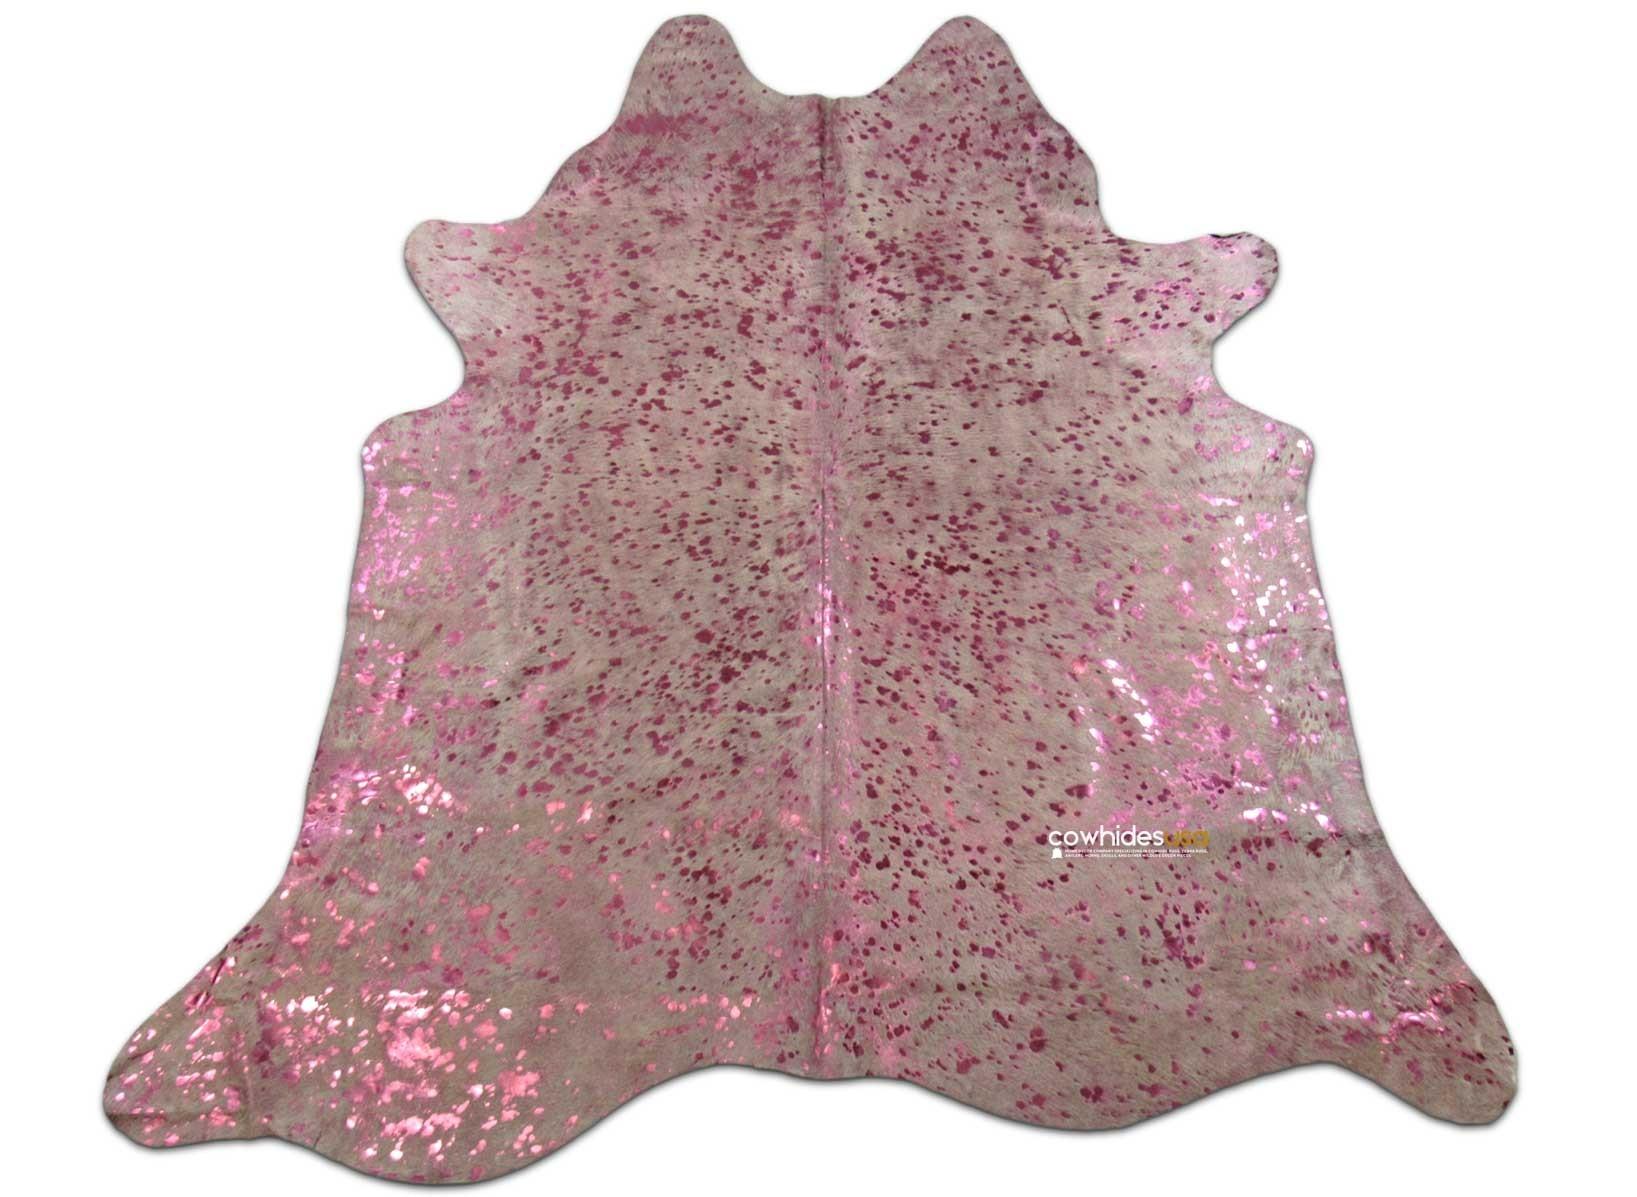 pink metallic cowhide rug size 77 x 7 ft pink metallic on offwhite cow hide skin rug i776